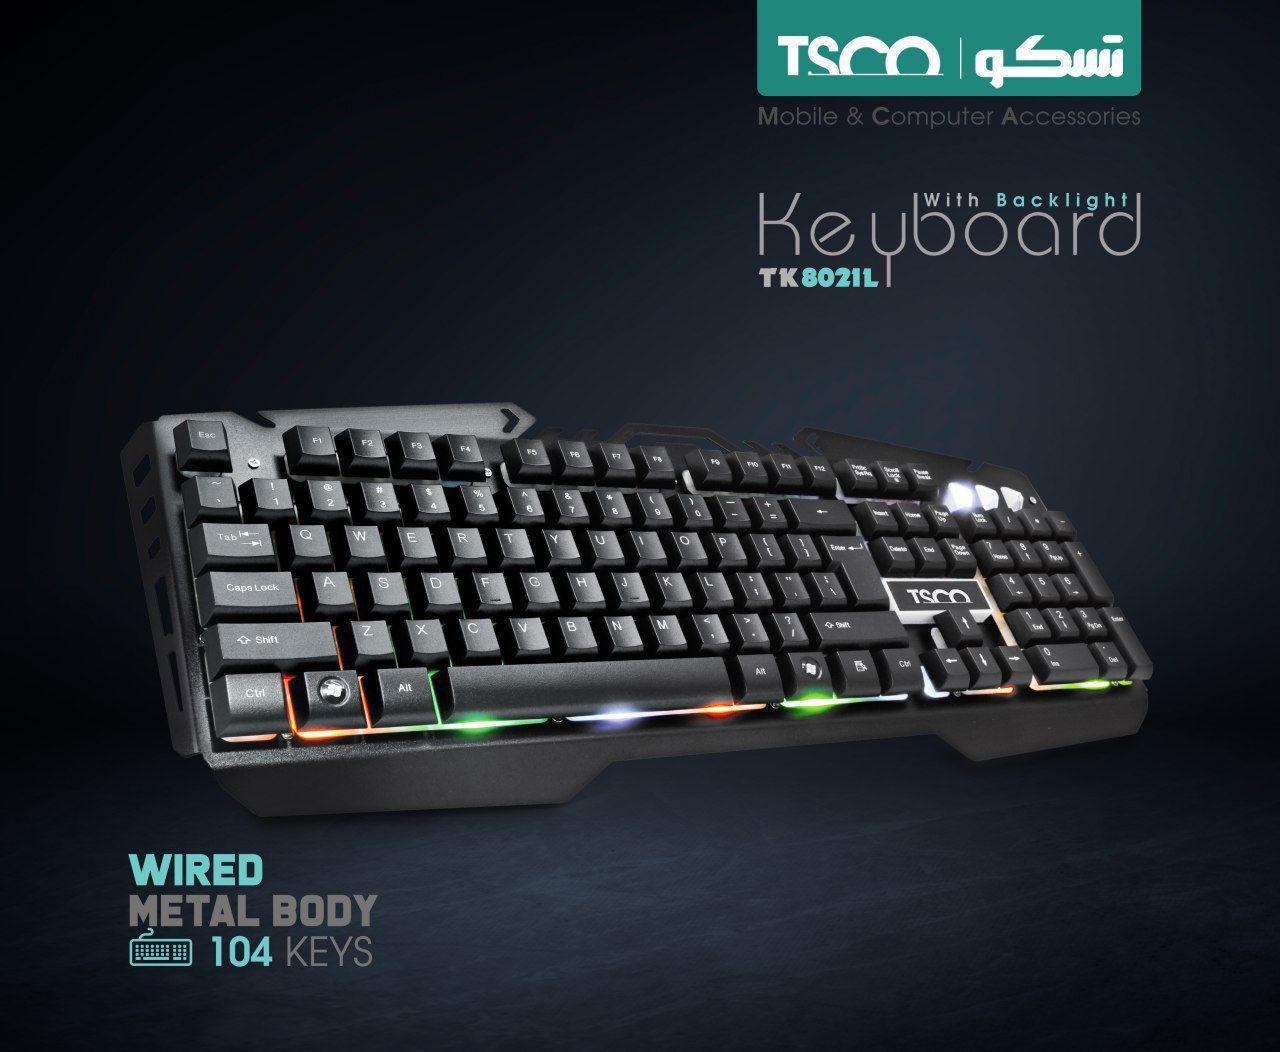 کیبورد برند TSCO مدل TK8021